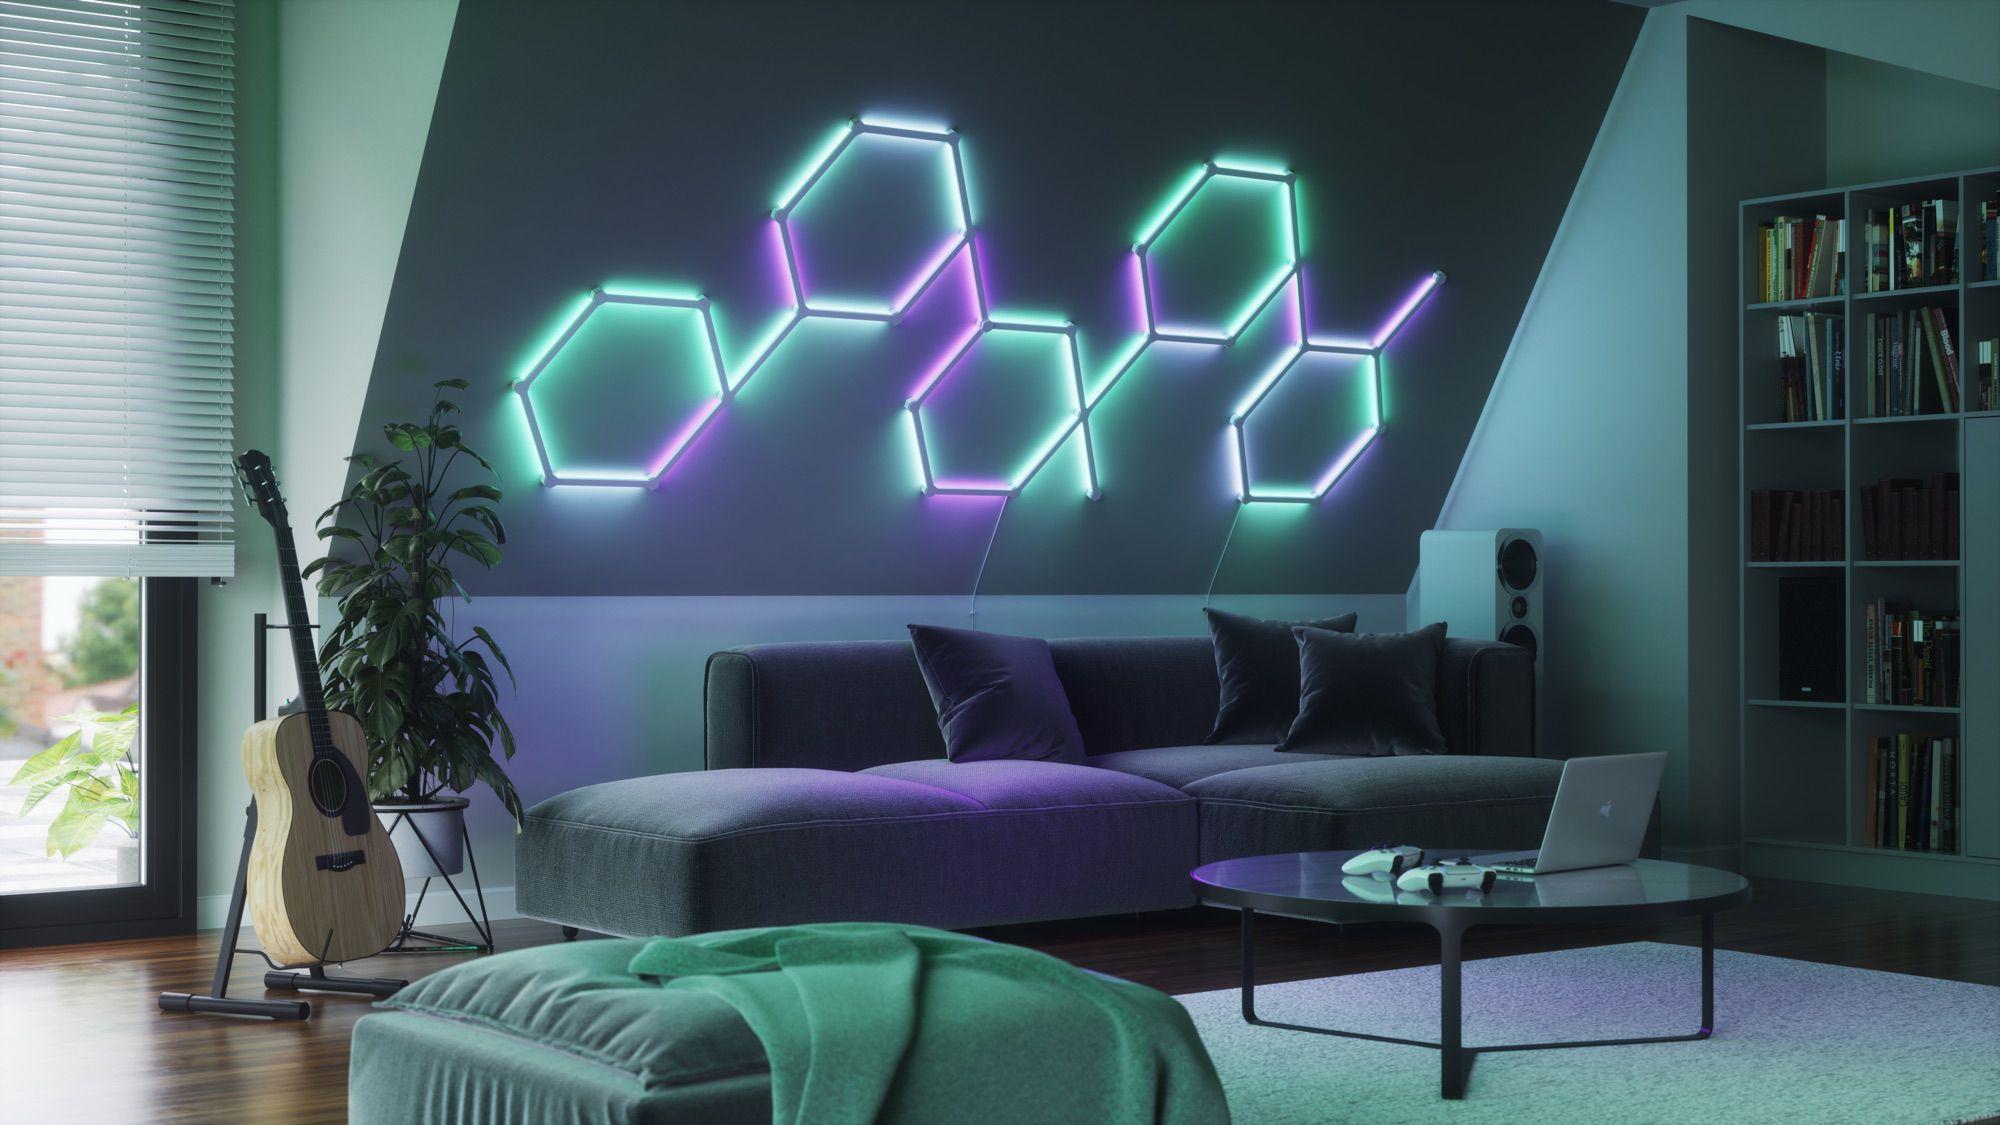 photo of Nanoleaf Launches 'Lines' LED Light Bars image